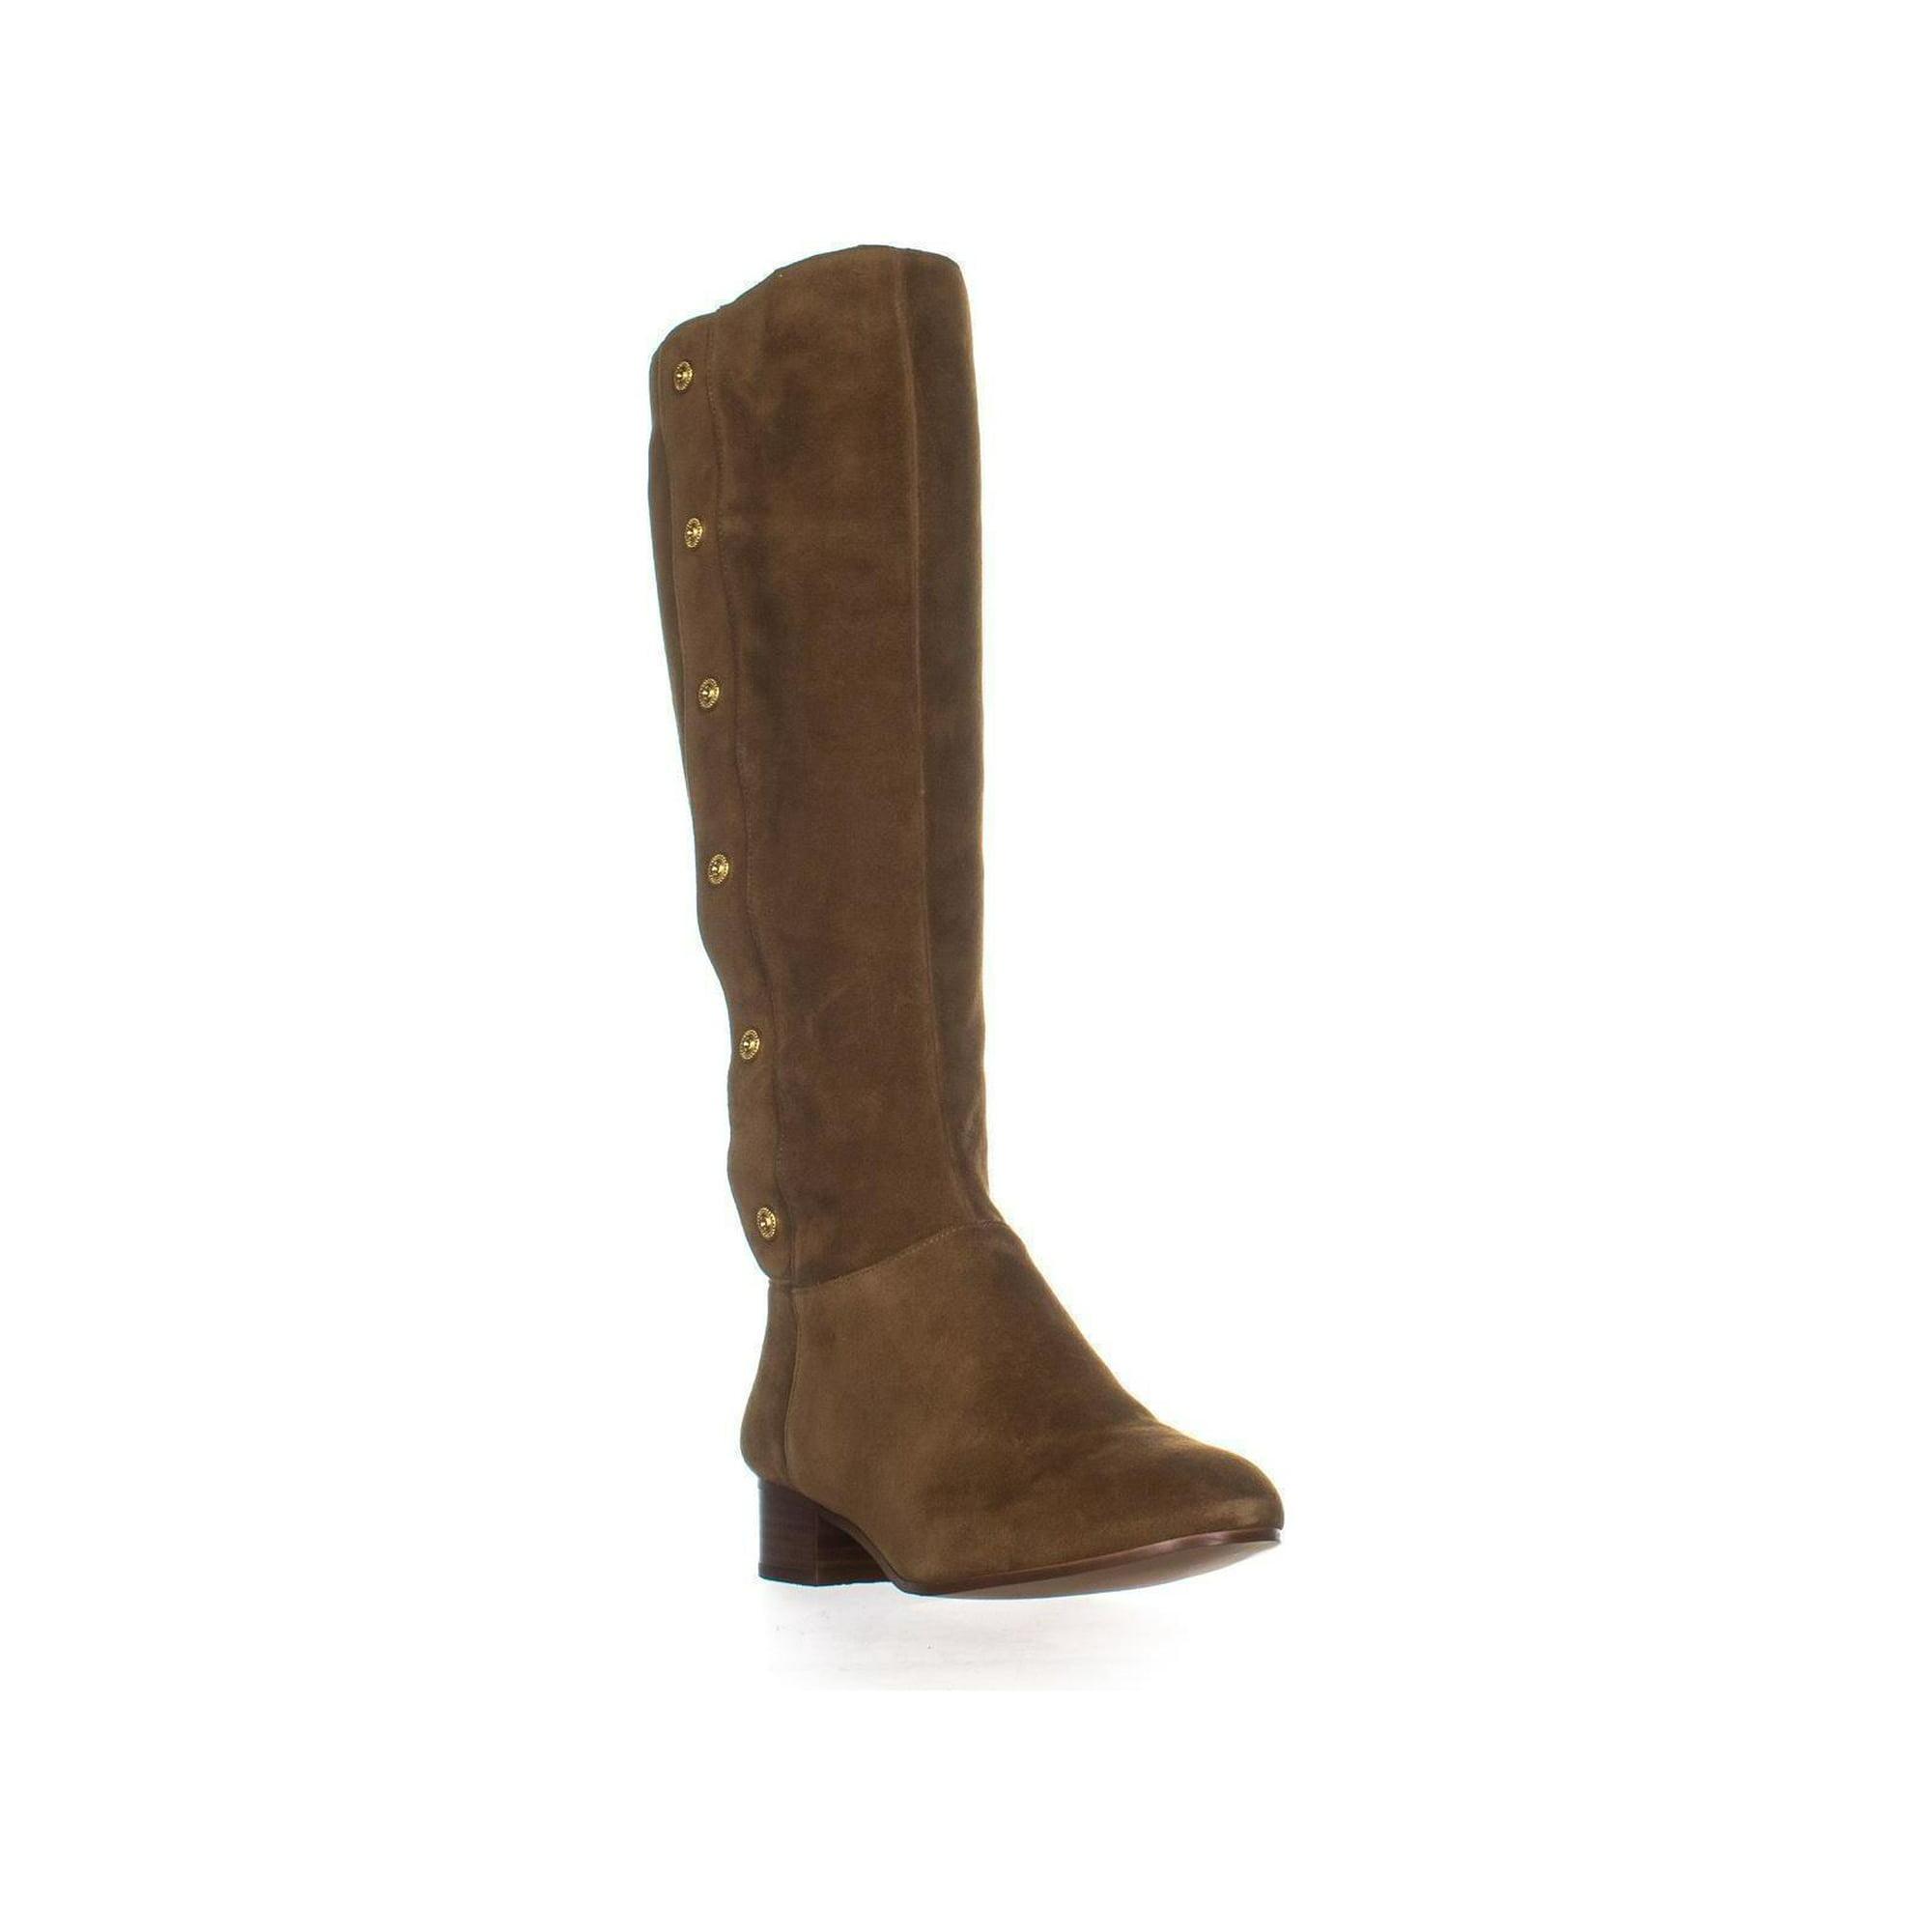 c36b1d2b793 Nine West Oreyan Knee High Riding Boots